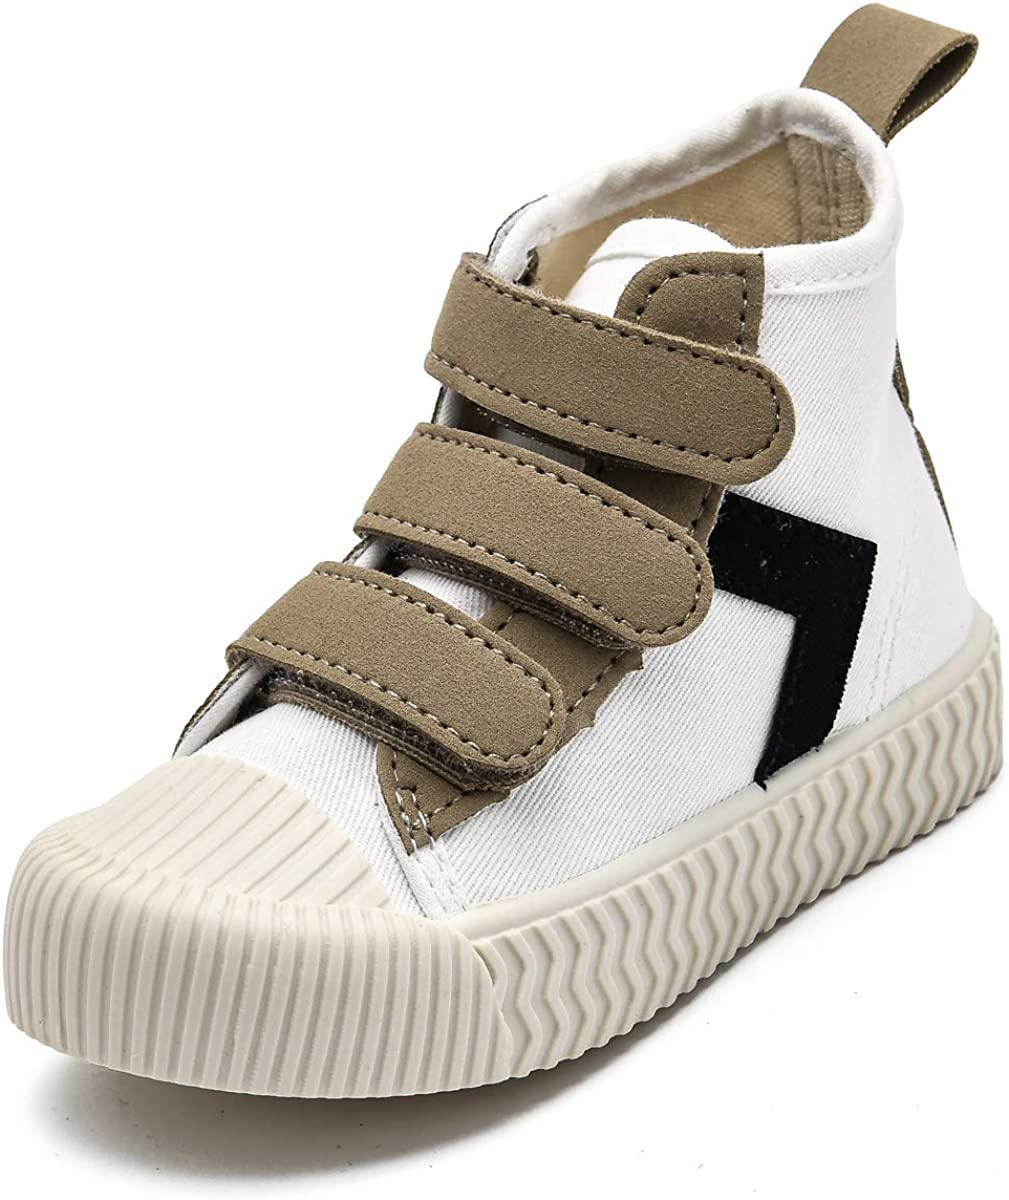 Folltoshe Toddler Boys Girls High Top Hook Loop Colorado Springs Mall Sneaker Ranking TOP9 and Litt